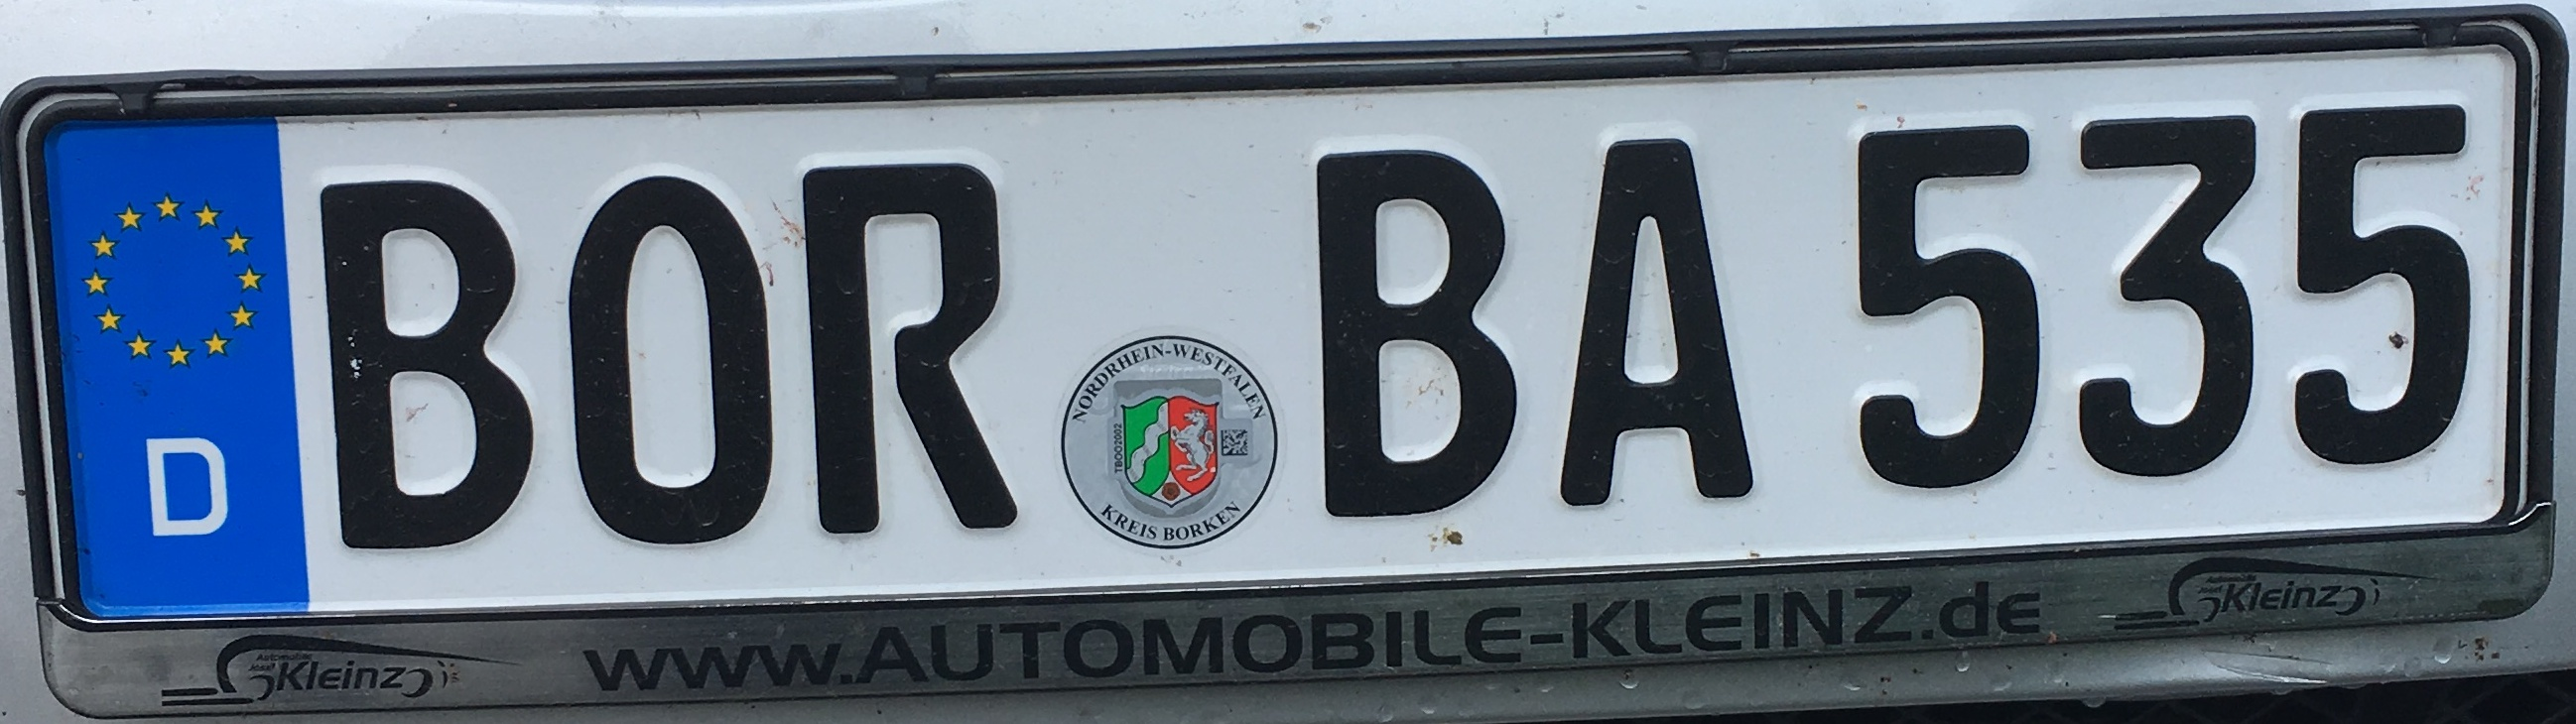 Registrační znaky Bulharsko - BOR - okres Borken, foto: www.podalnici.cz